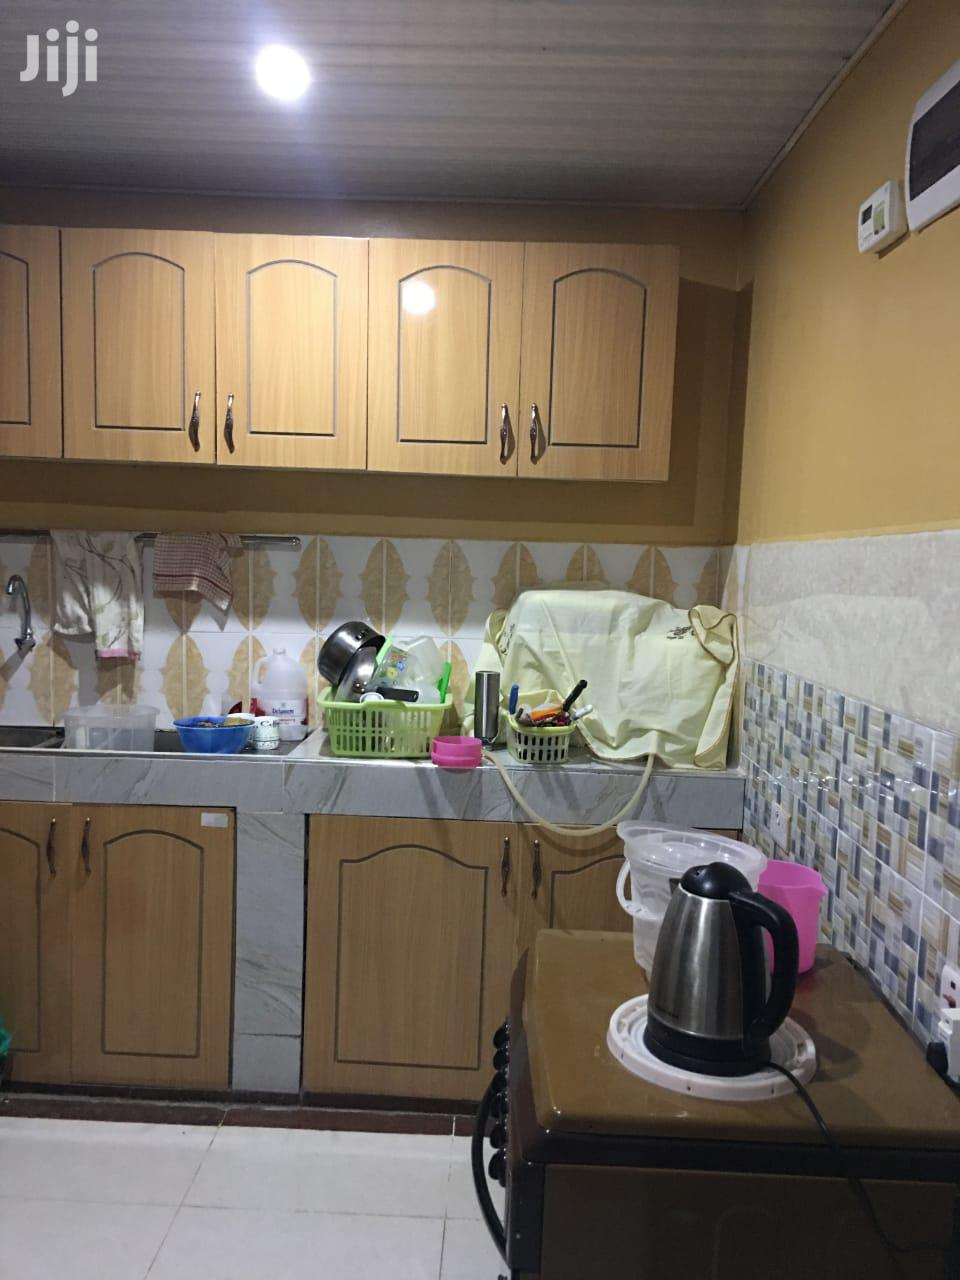 For SALE 3bedrm in Juda, Kenyatta Rd 2km Off Thika Road   Houses & Apartments For Sale for sale in Kalimoni, Kiambu, Kenya